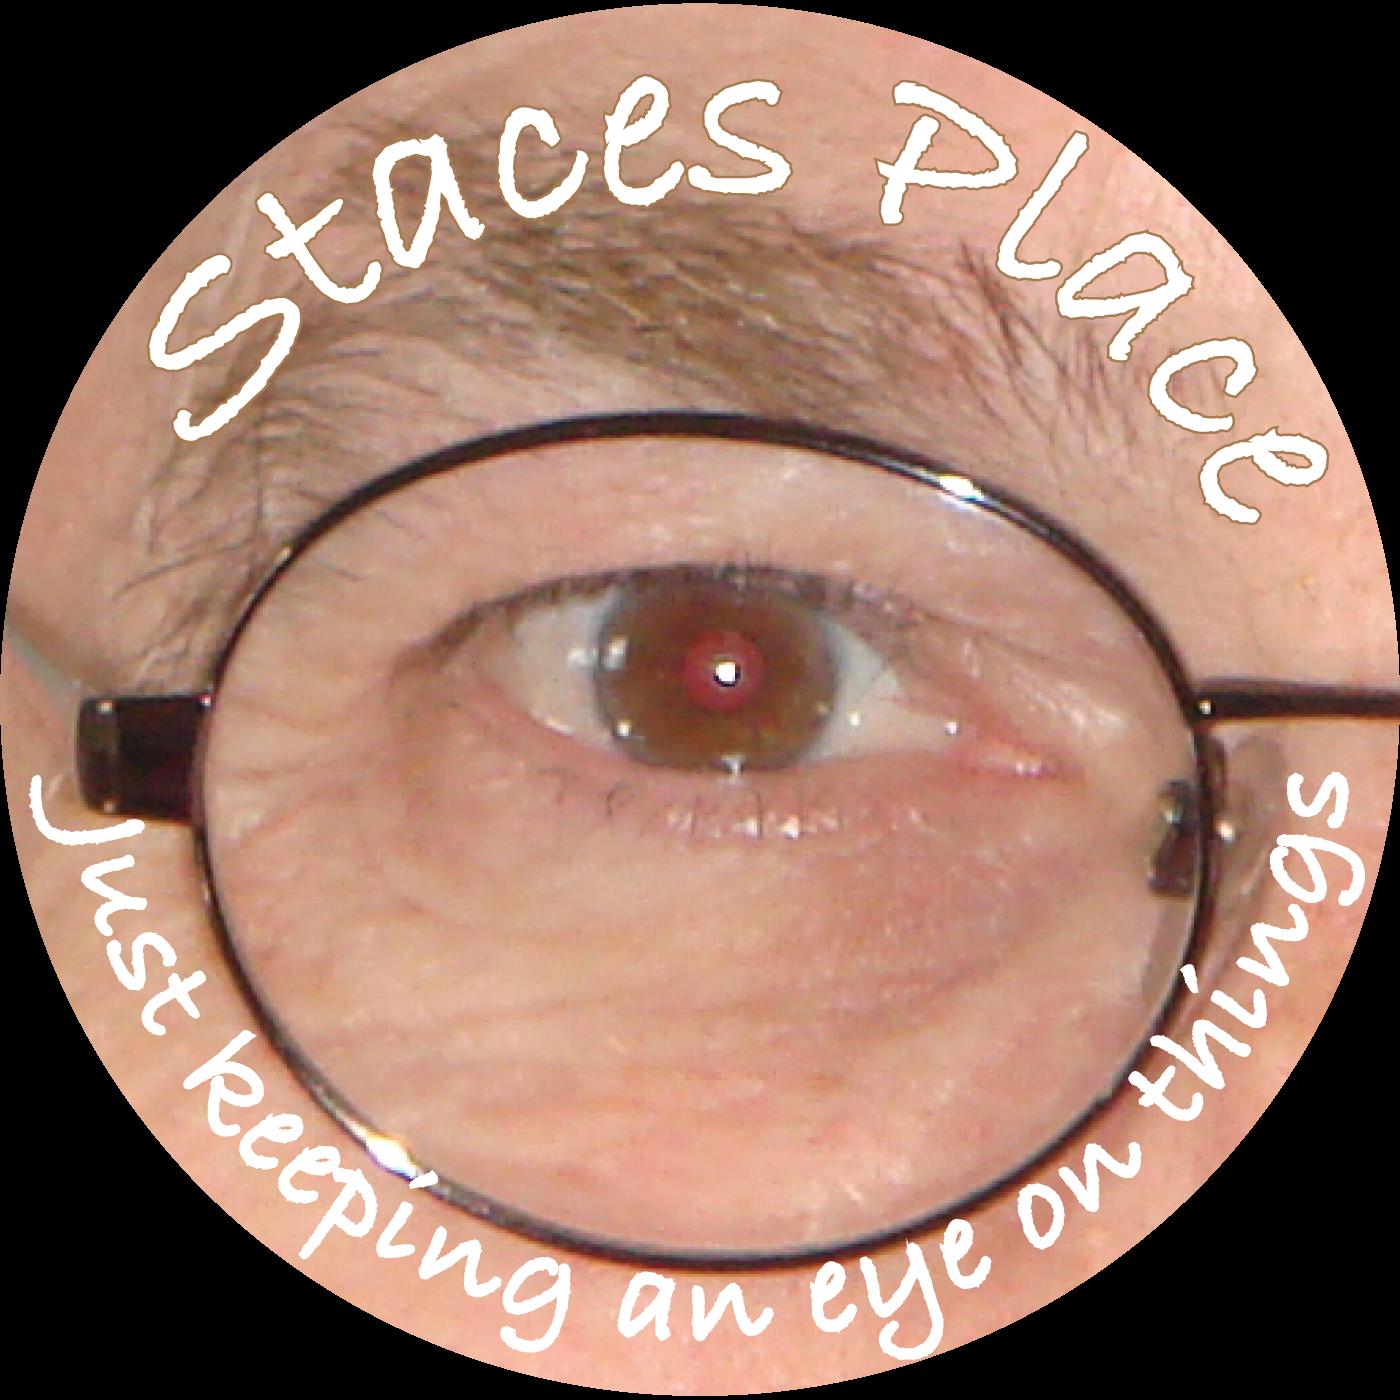 Staces Place